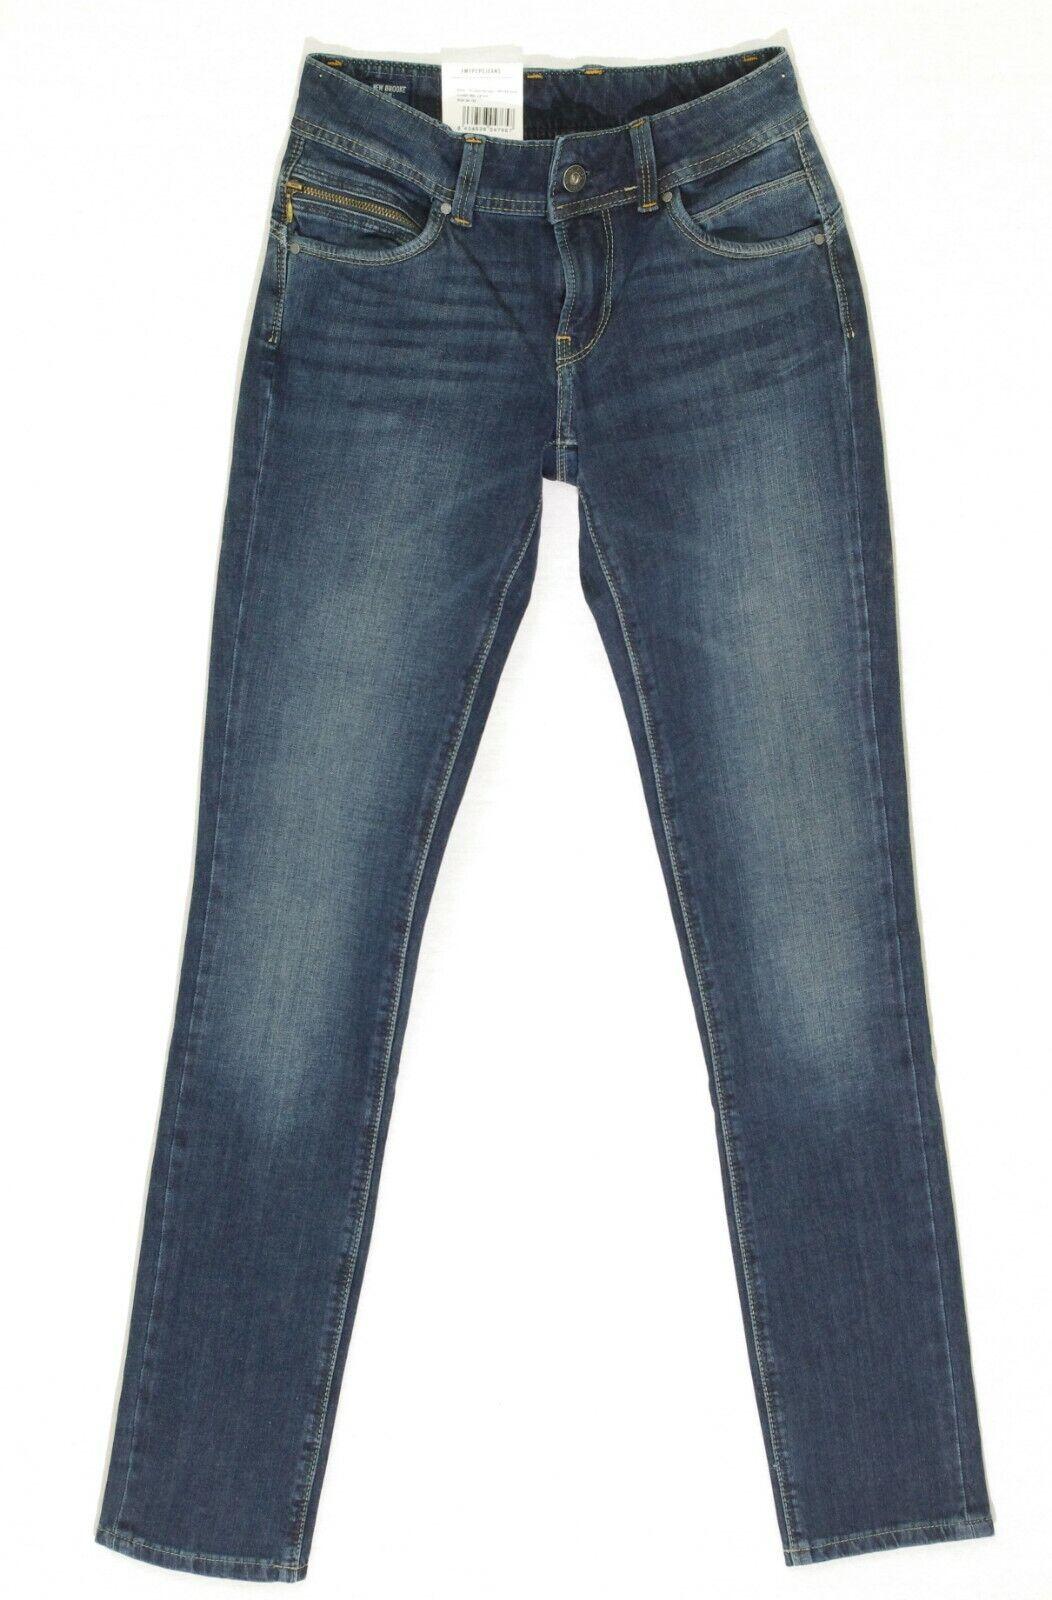 a0eff53eef4 PEPE JEANS NEW BROOKE jean slim fit femme bleu PL200019CD62 W 24 L ...